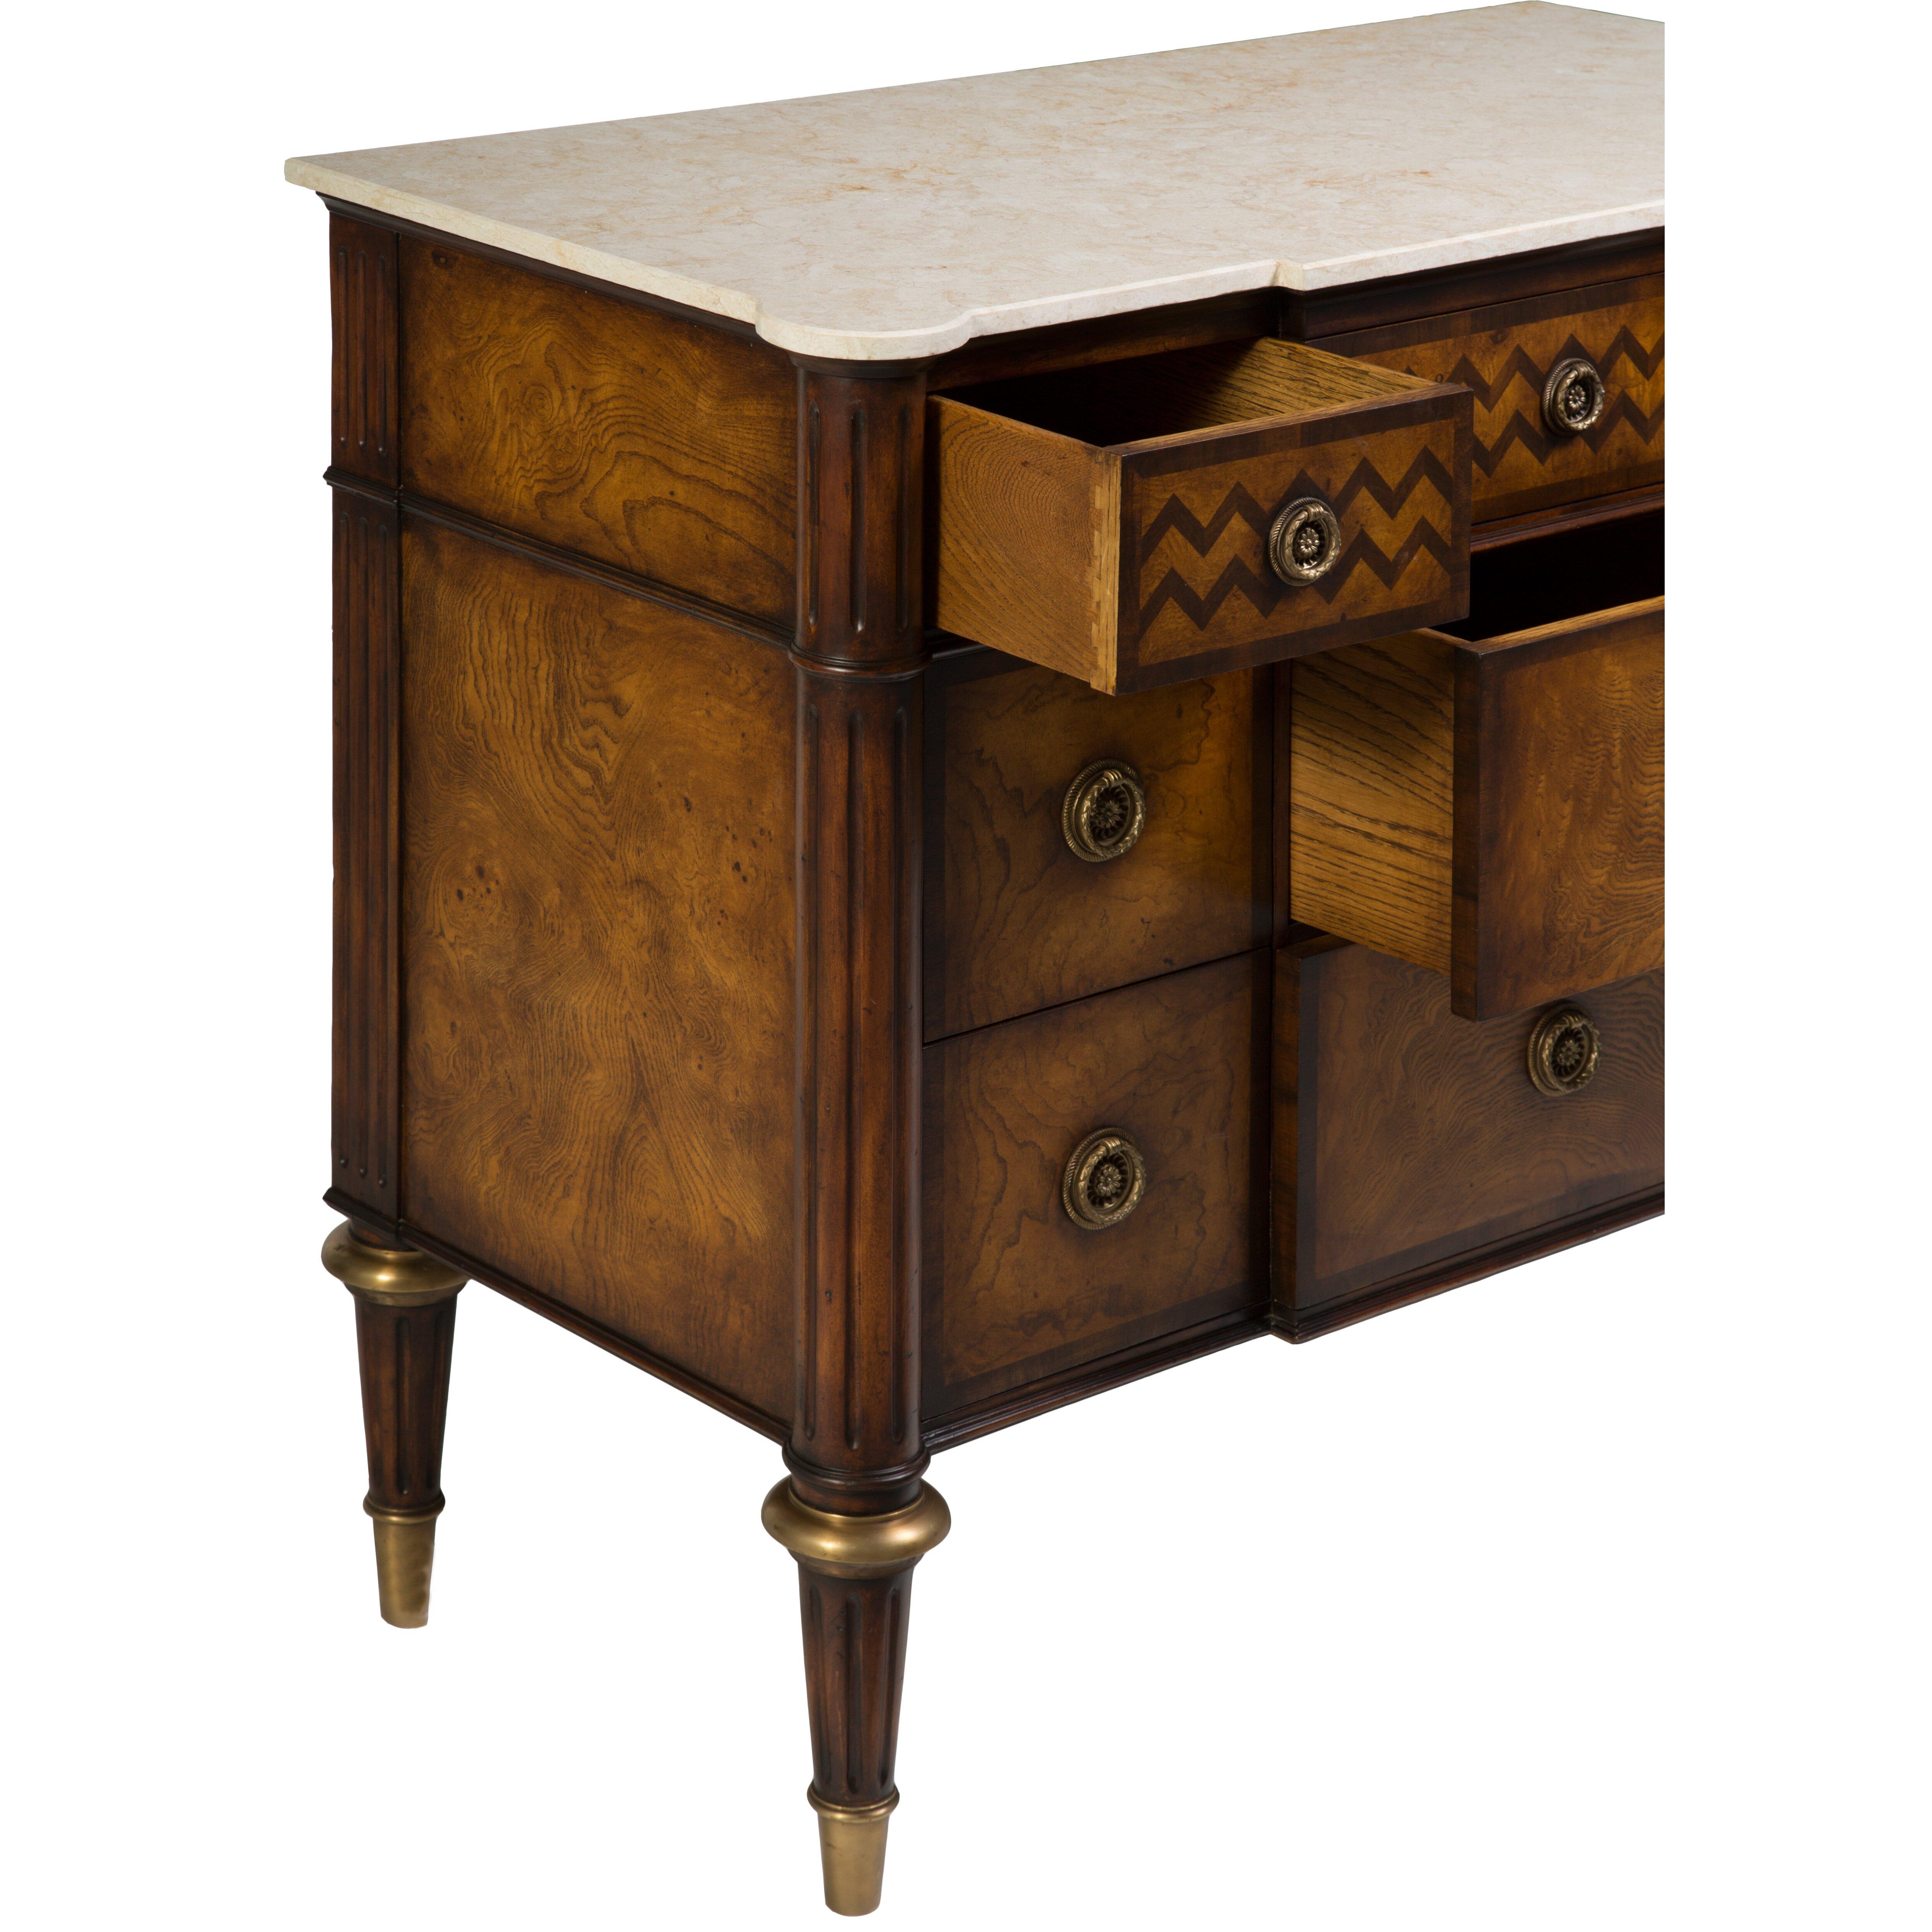 safavieh xristos chest of drawers reviews wayfair. Black Bedroom Furniture Sets. Home Design Ideas